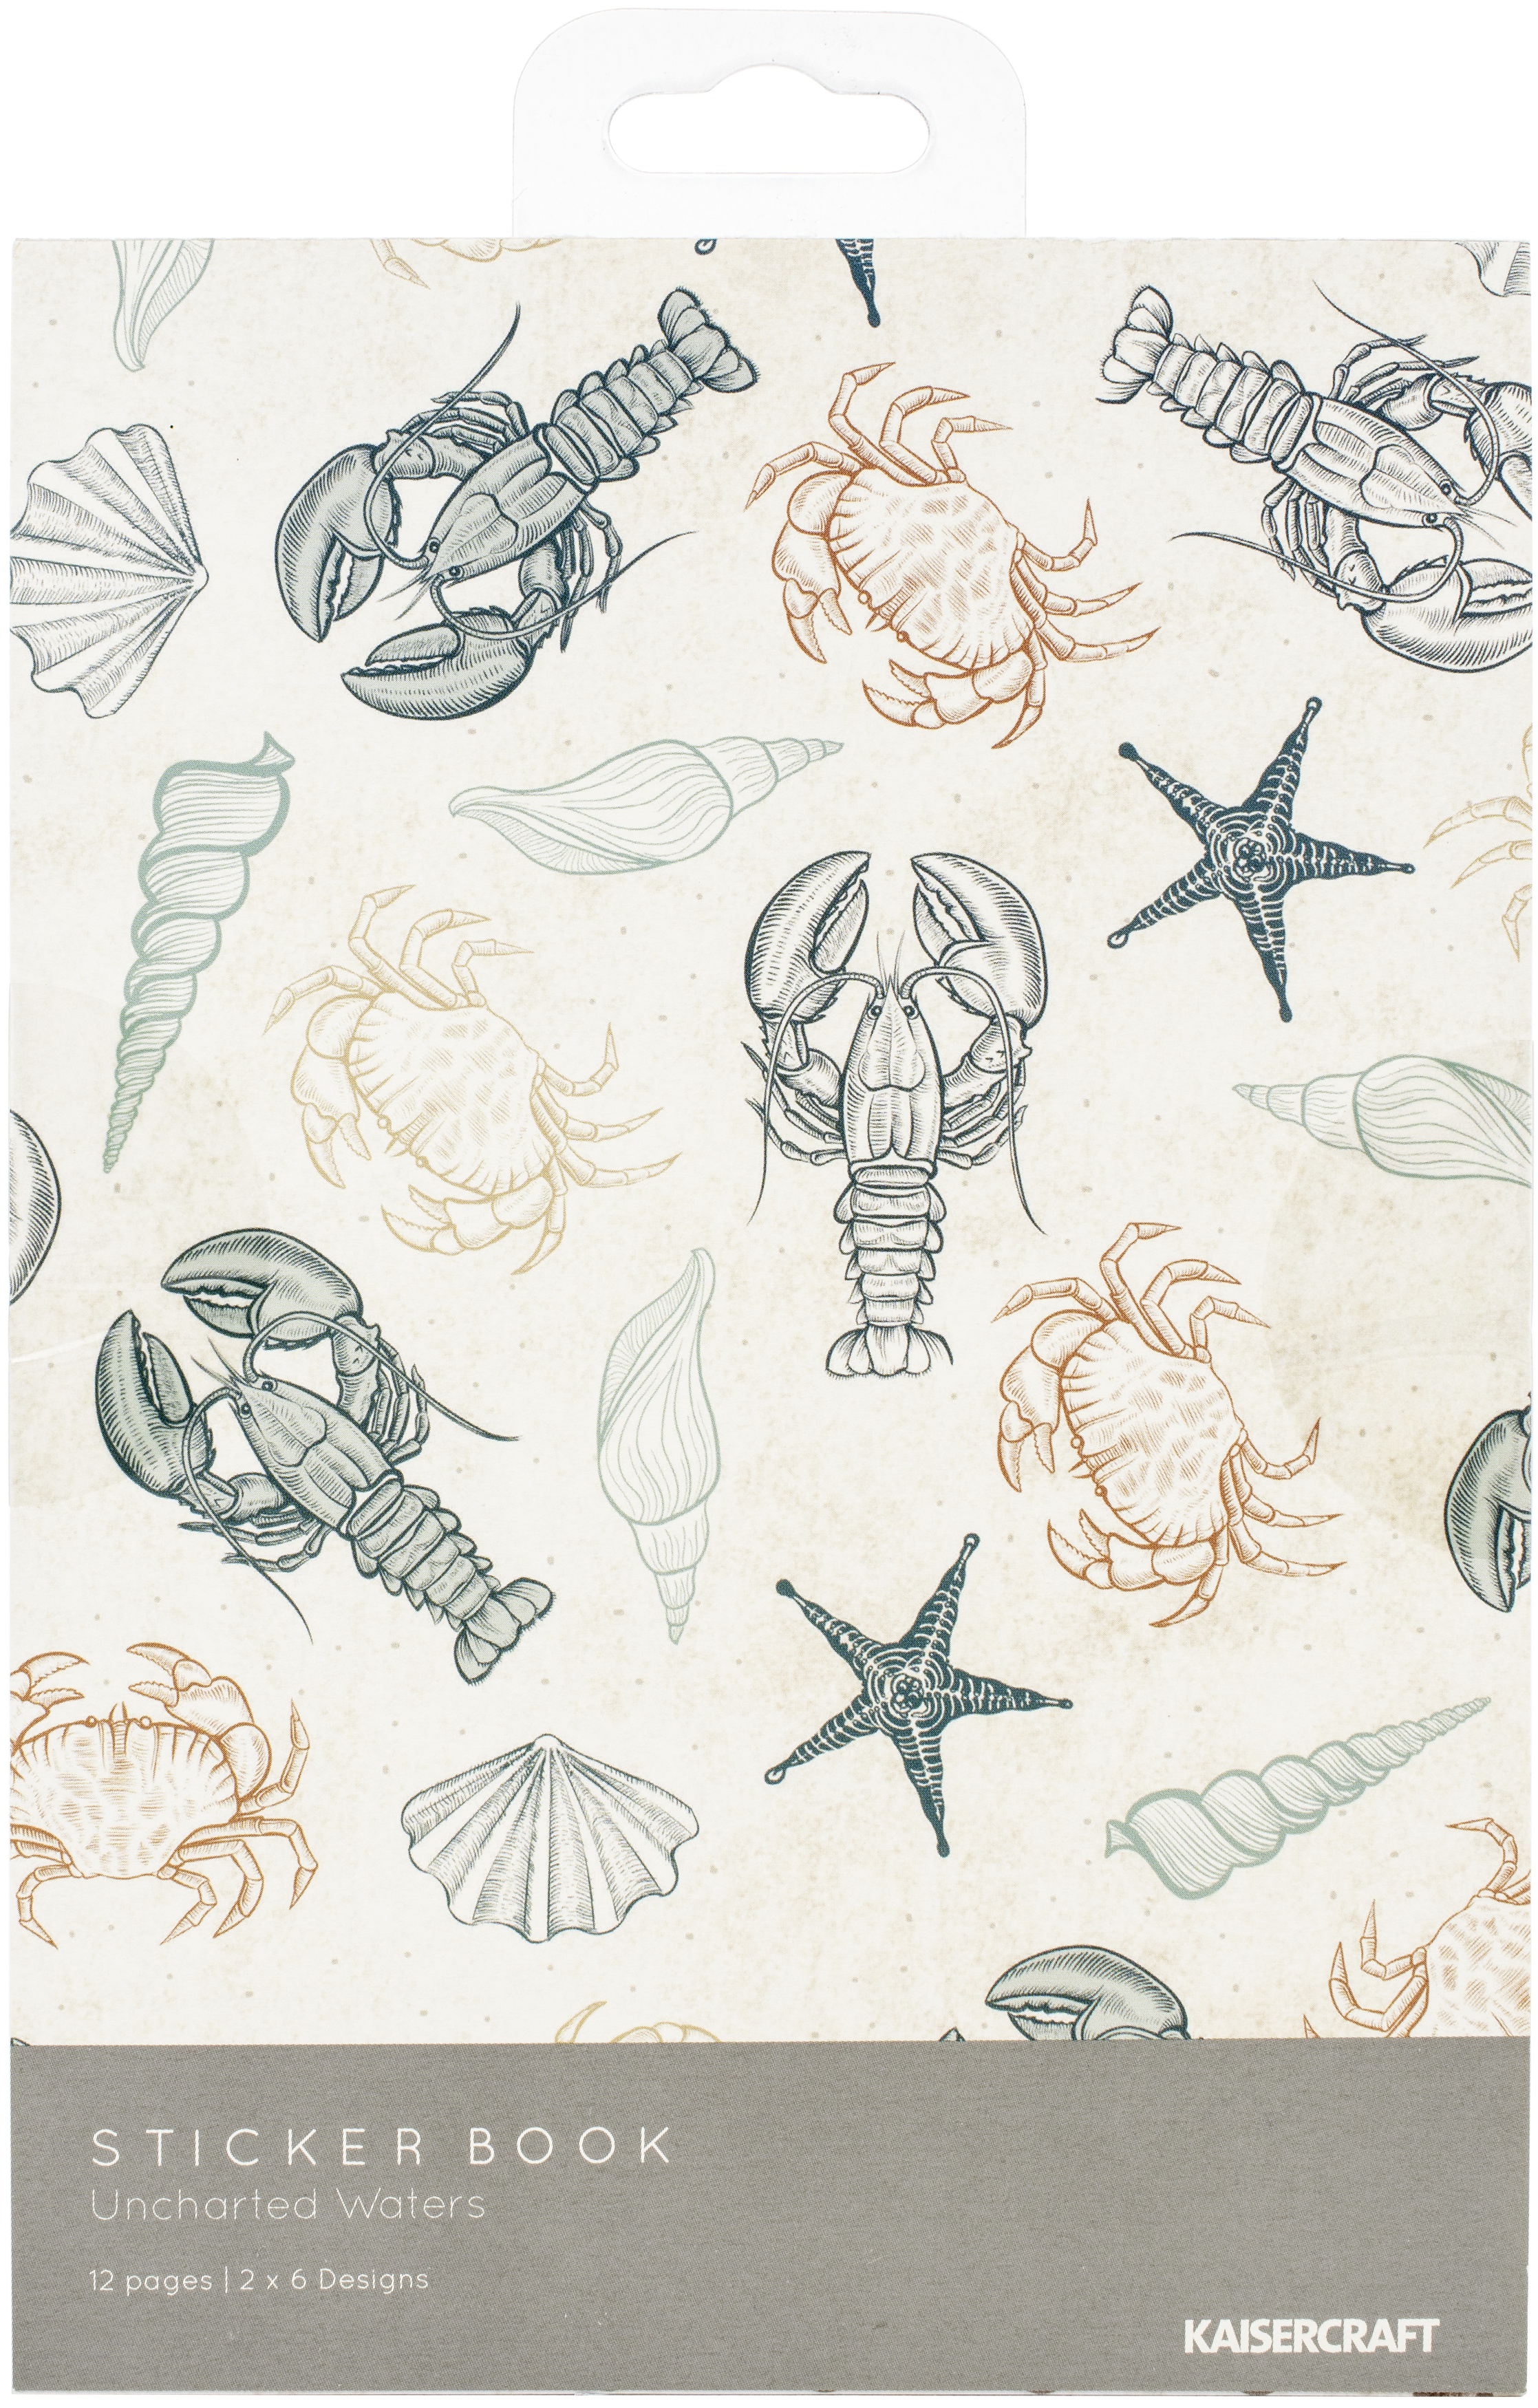 Kaisercraft Uncharted Waters - Sticker Book